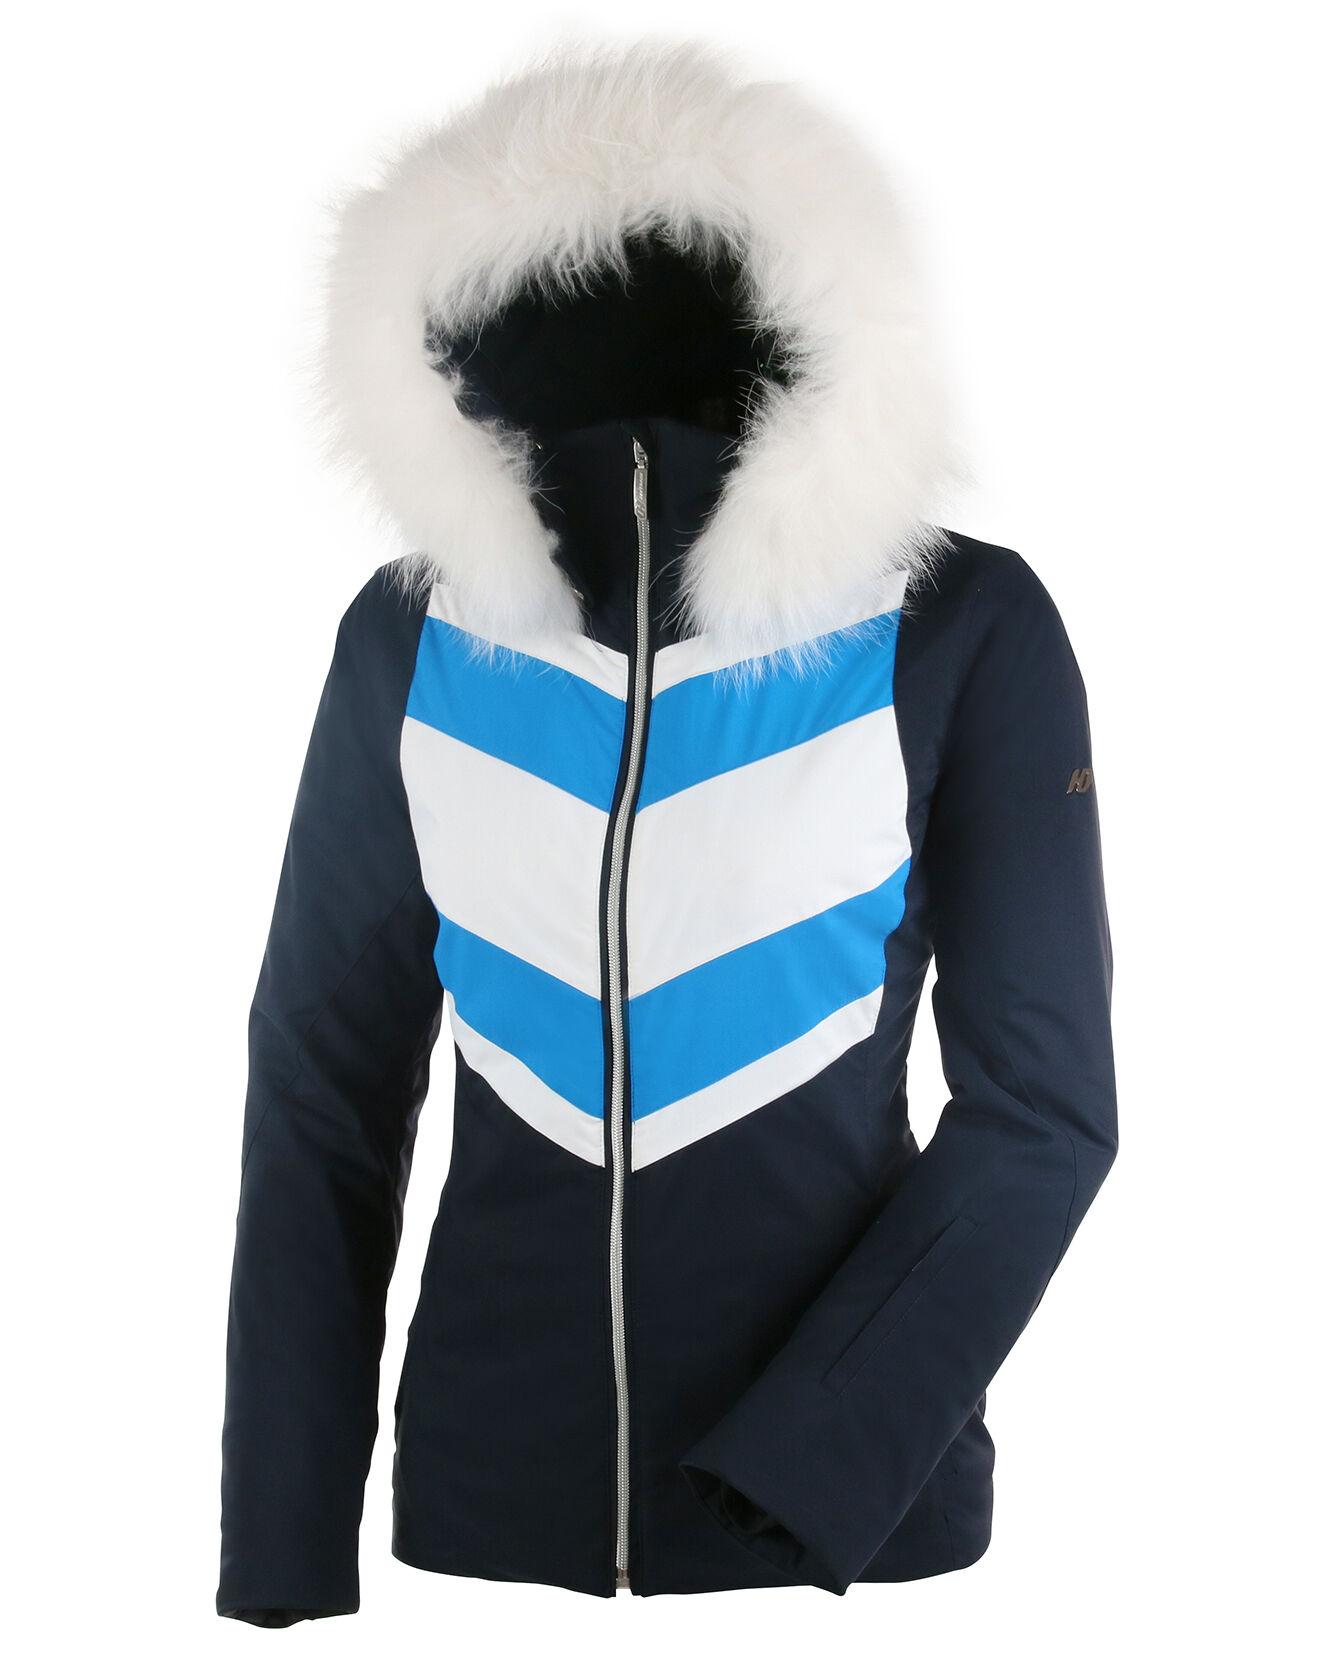 Duvillard - Veste de ski Dufour fourrure véritable marine/blanc